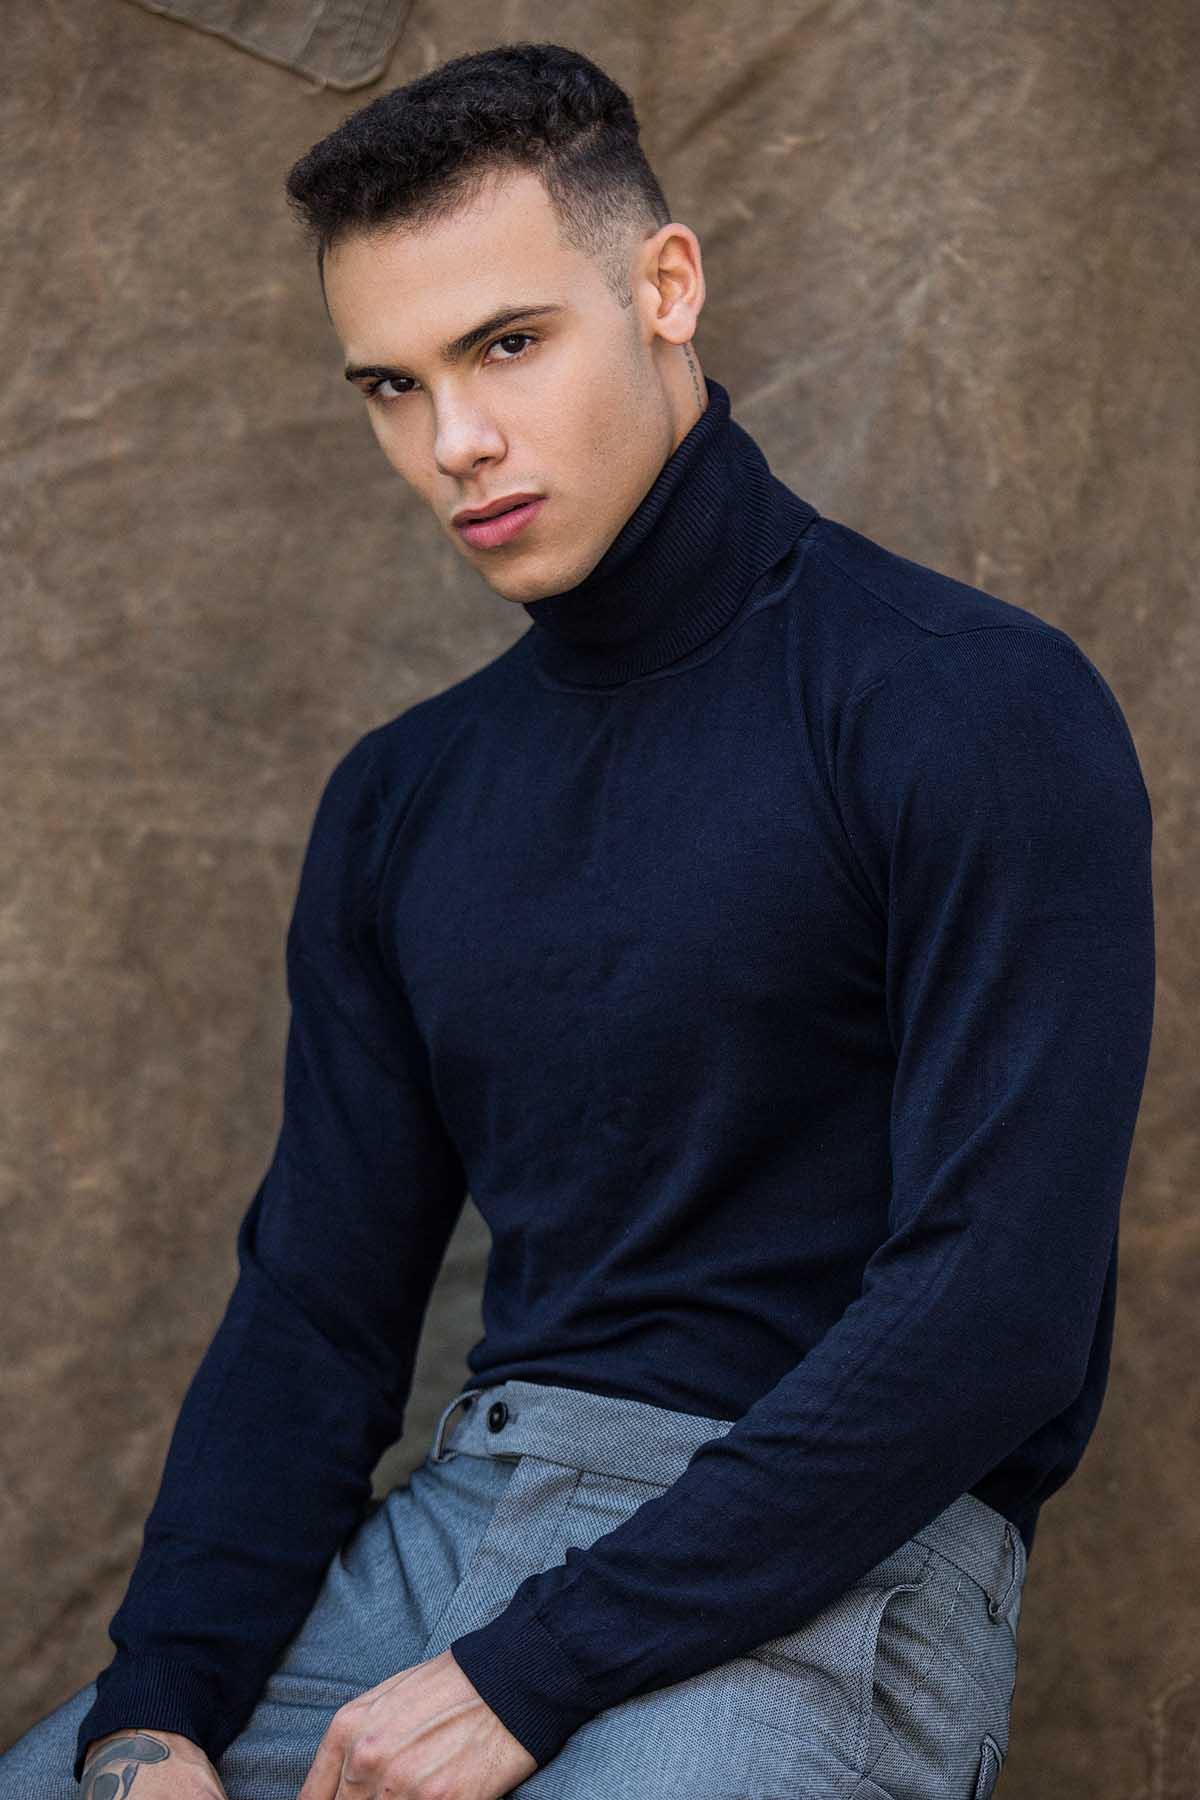 Felippe da Costa by Fael Gregorio for Brazilian Male Model